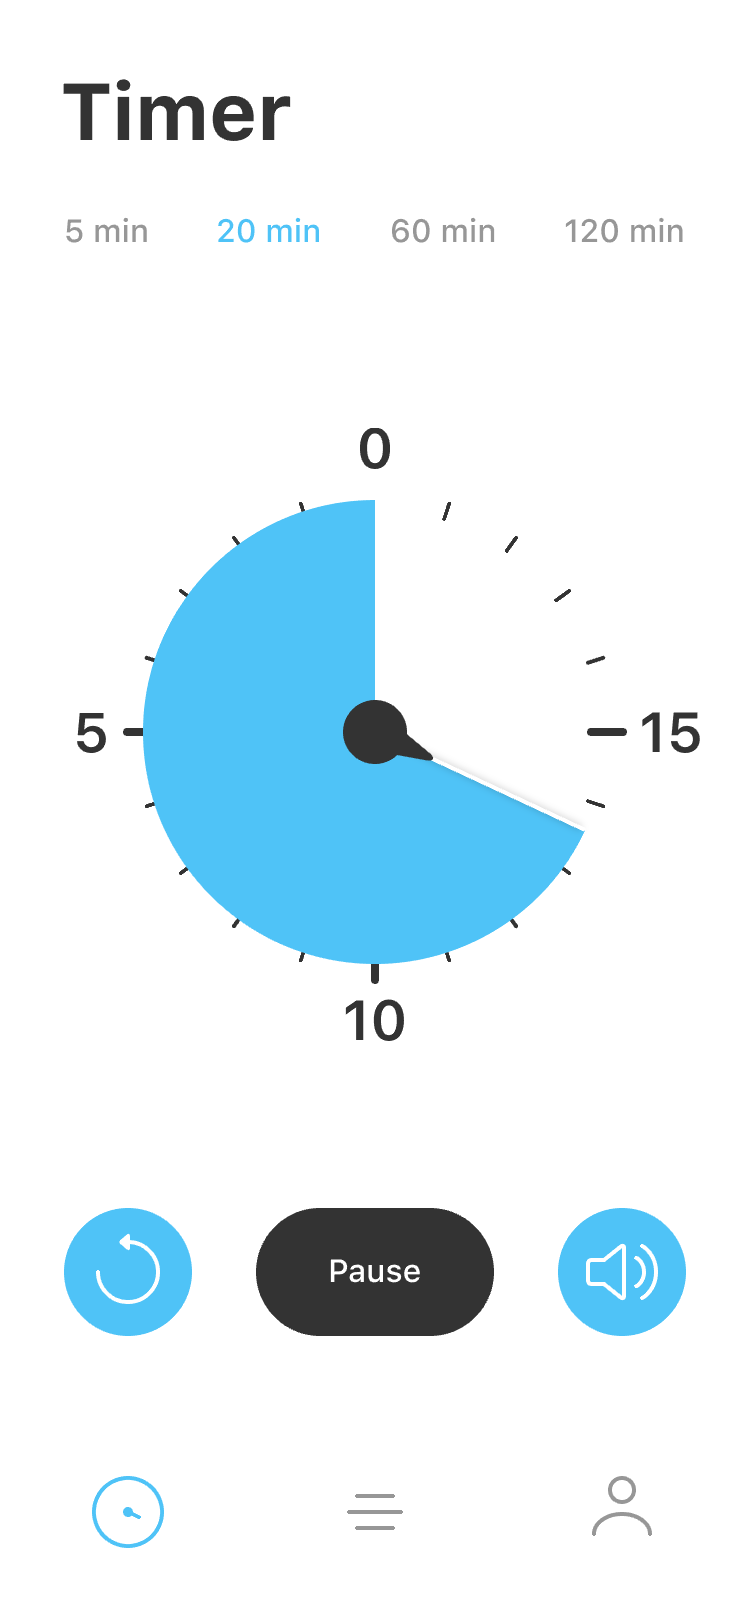 Timer 20min 12.5